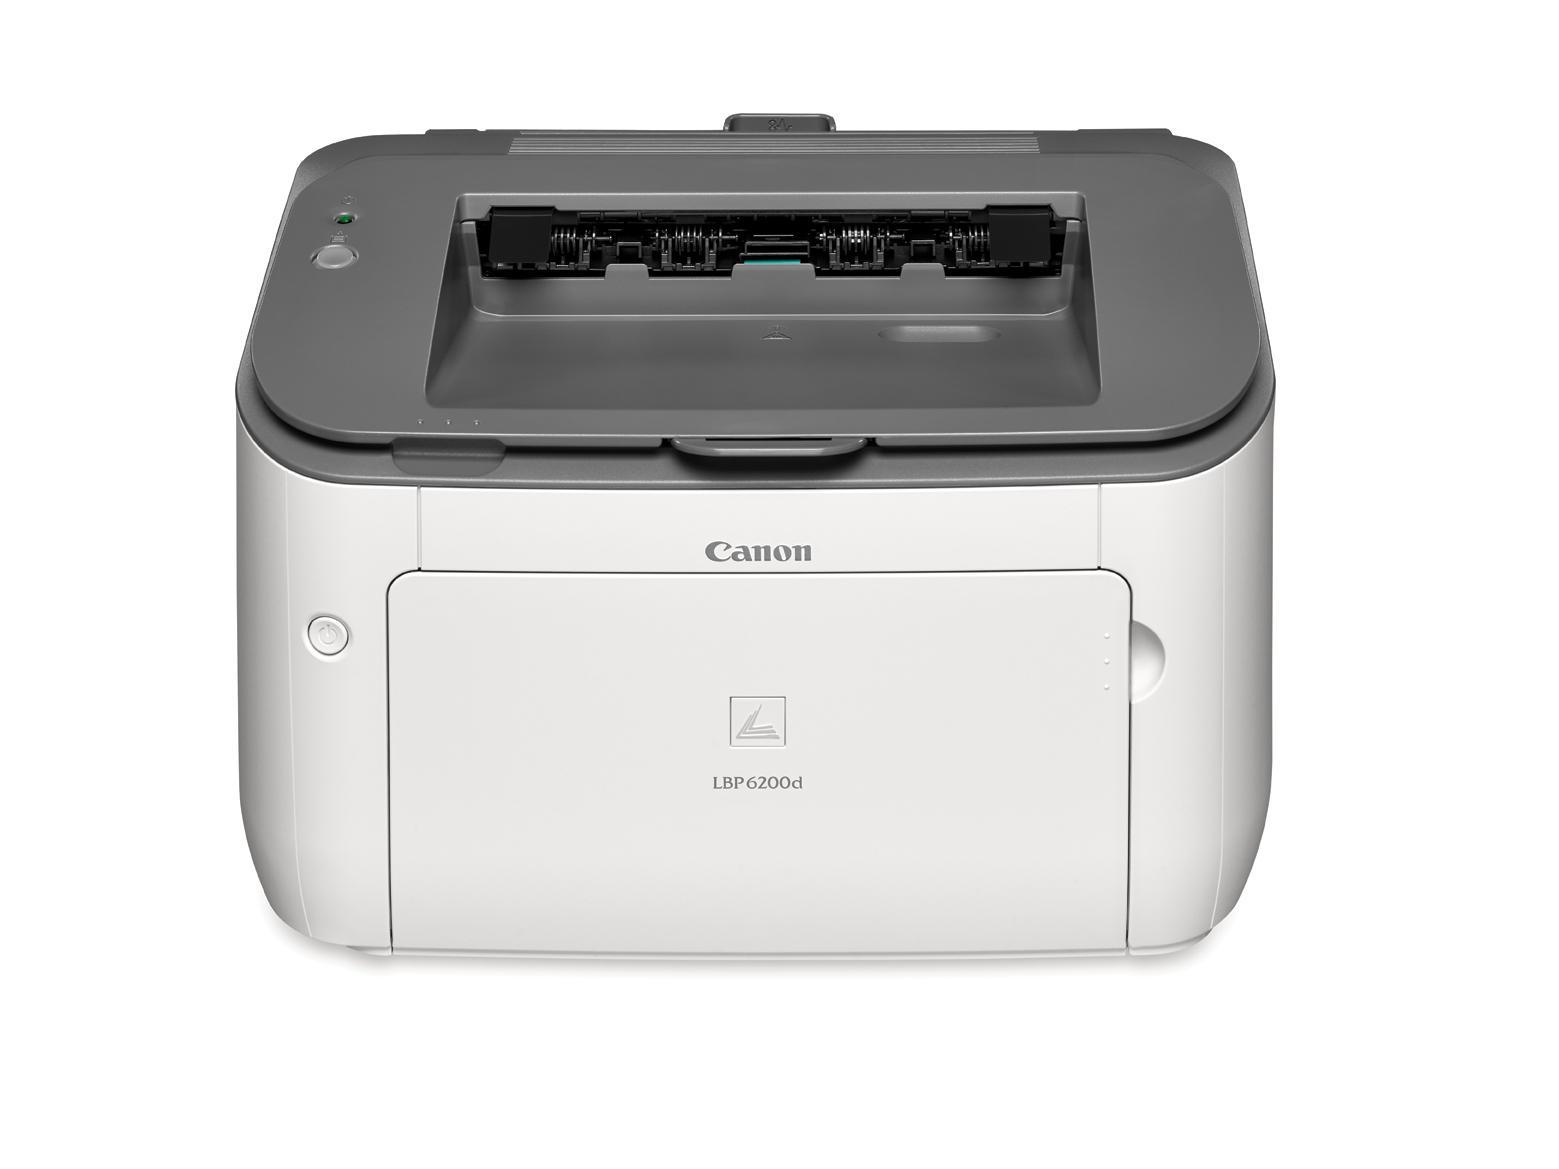 Заправка картриджа Canon i-SENSYS LBP6200d